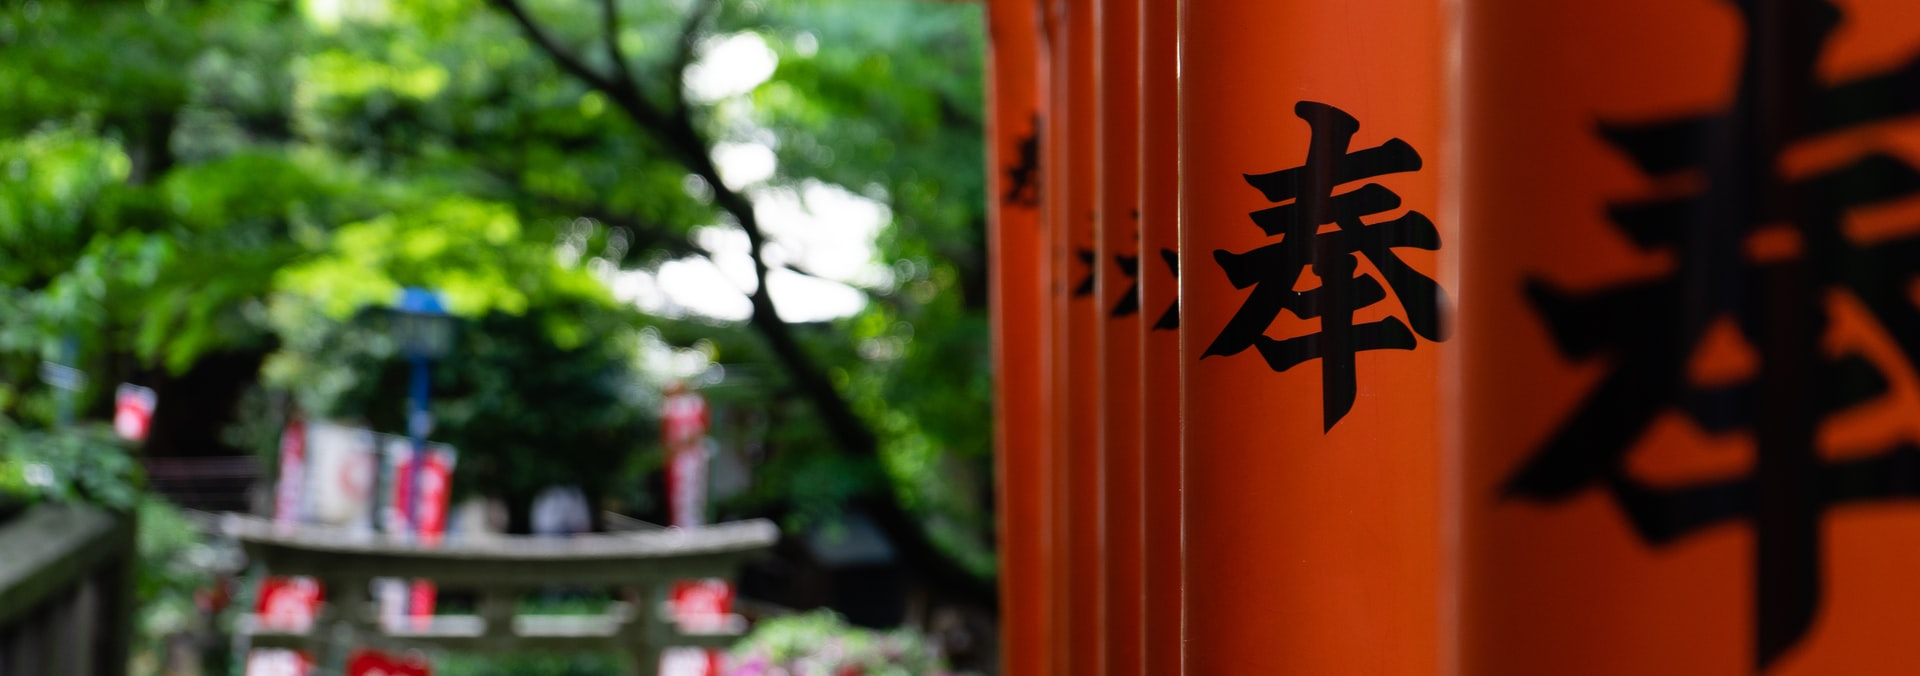 The Fushimi Inari Shrine in Japan